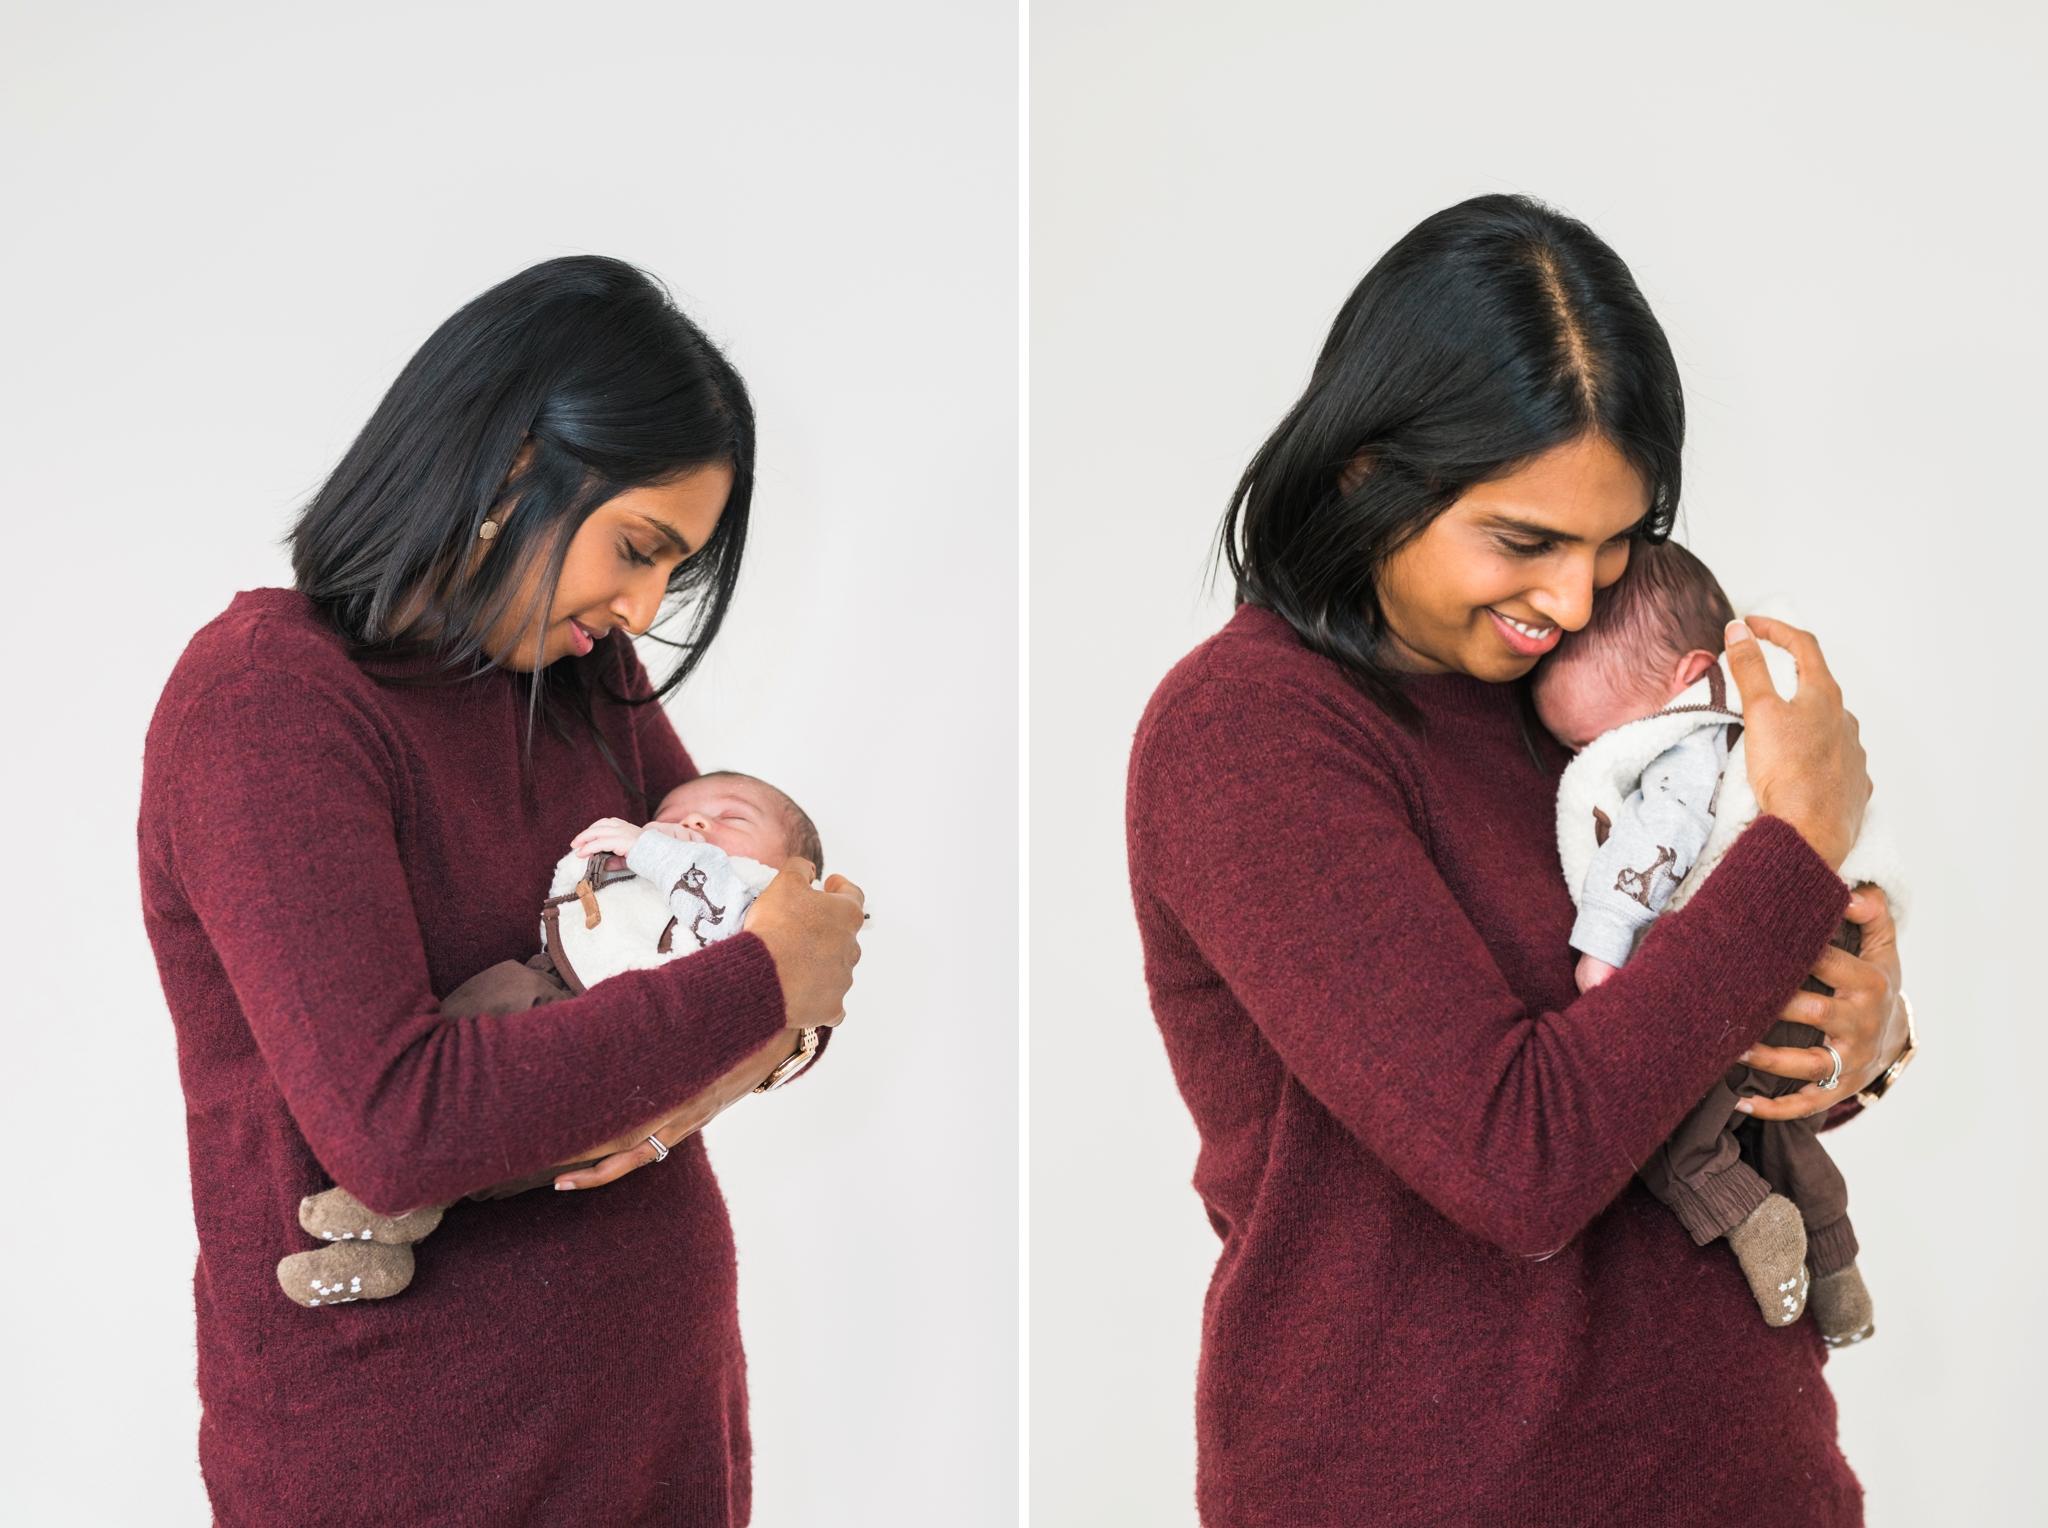 Emily Grace Photography, Lancaster PA Family Portrait Photographer, Lancaster, PA Newborn Photos